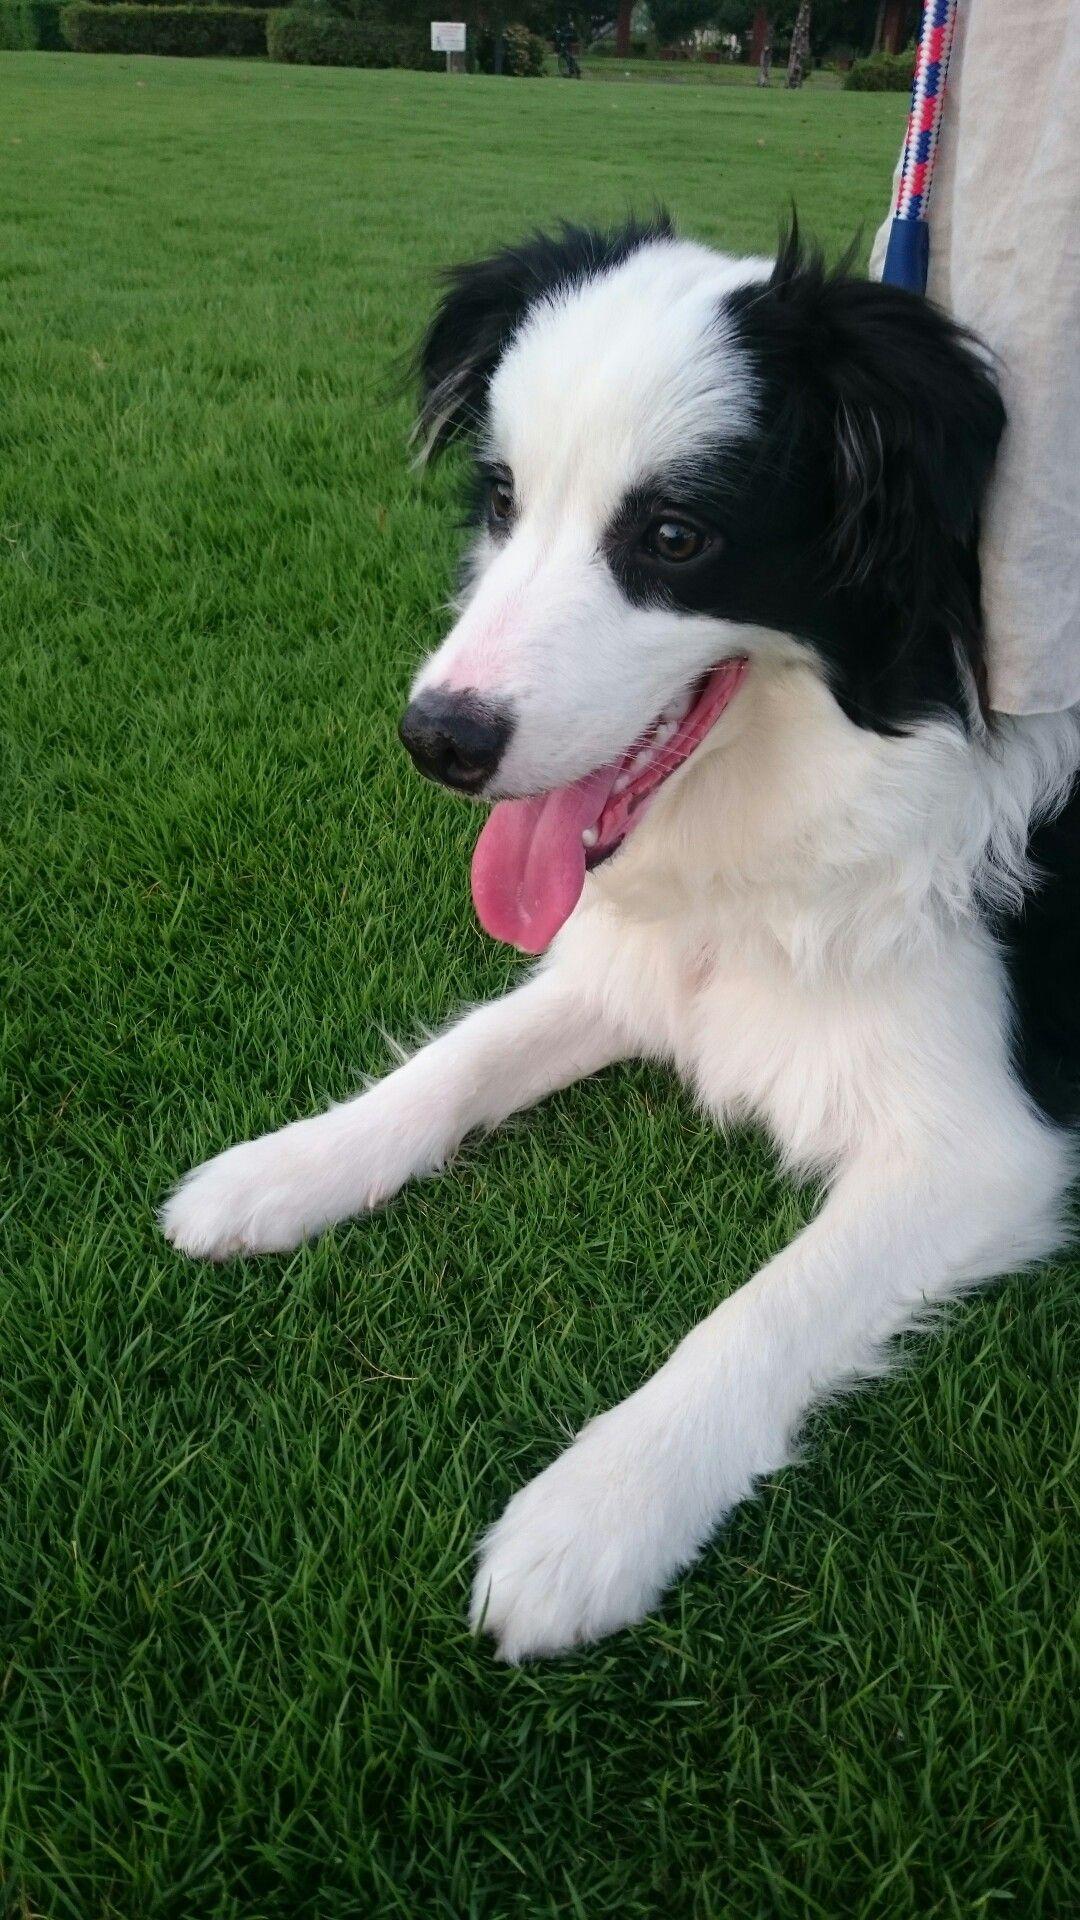 Meeka Yorkshire Terrier Mix Yorkshire Terrier Unique Dog Breeds